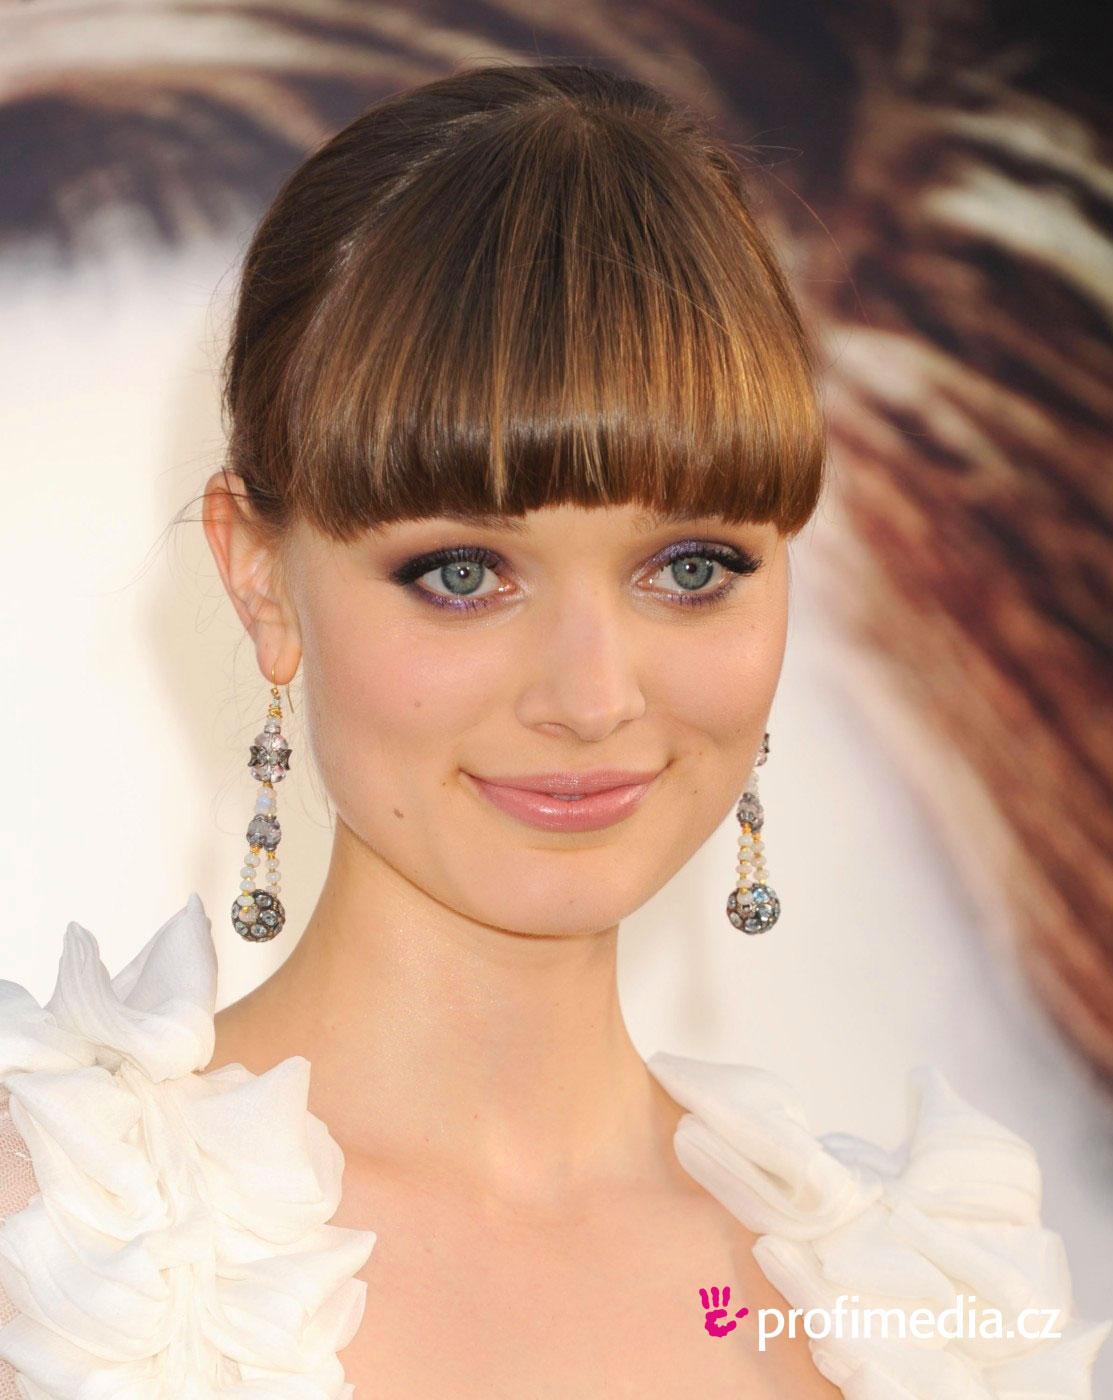 Bella Heathcote Hairstyle Easyhairstyler